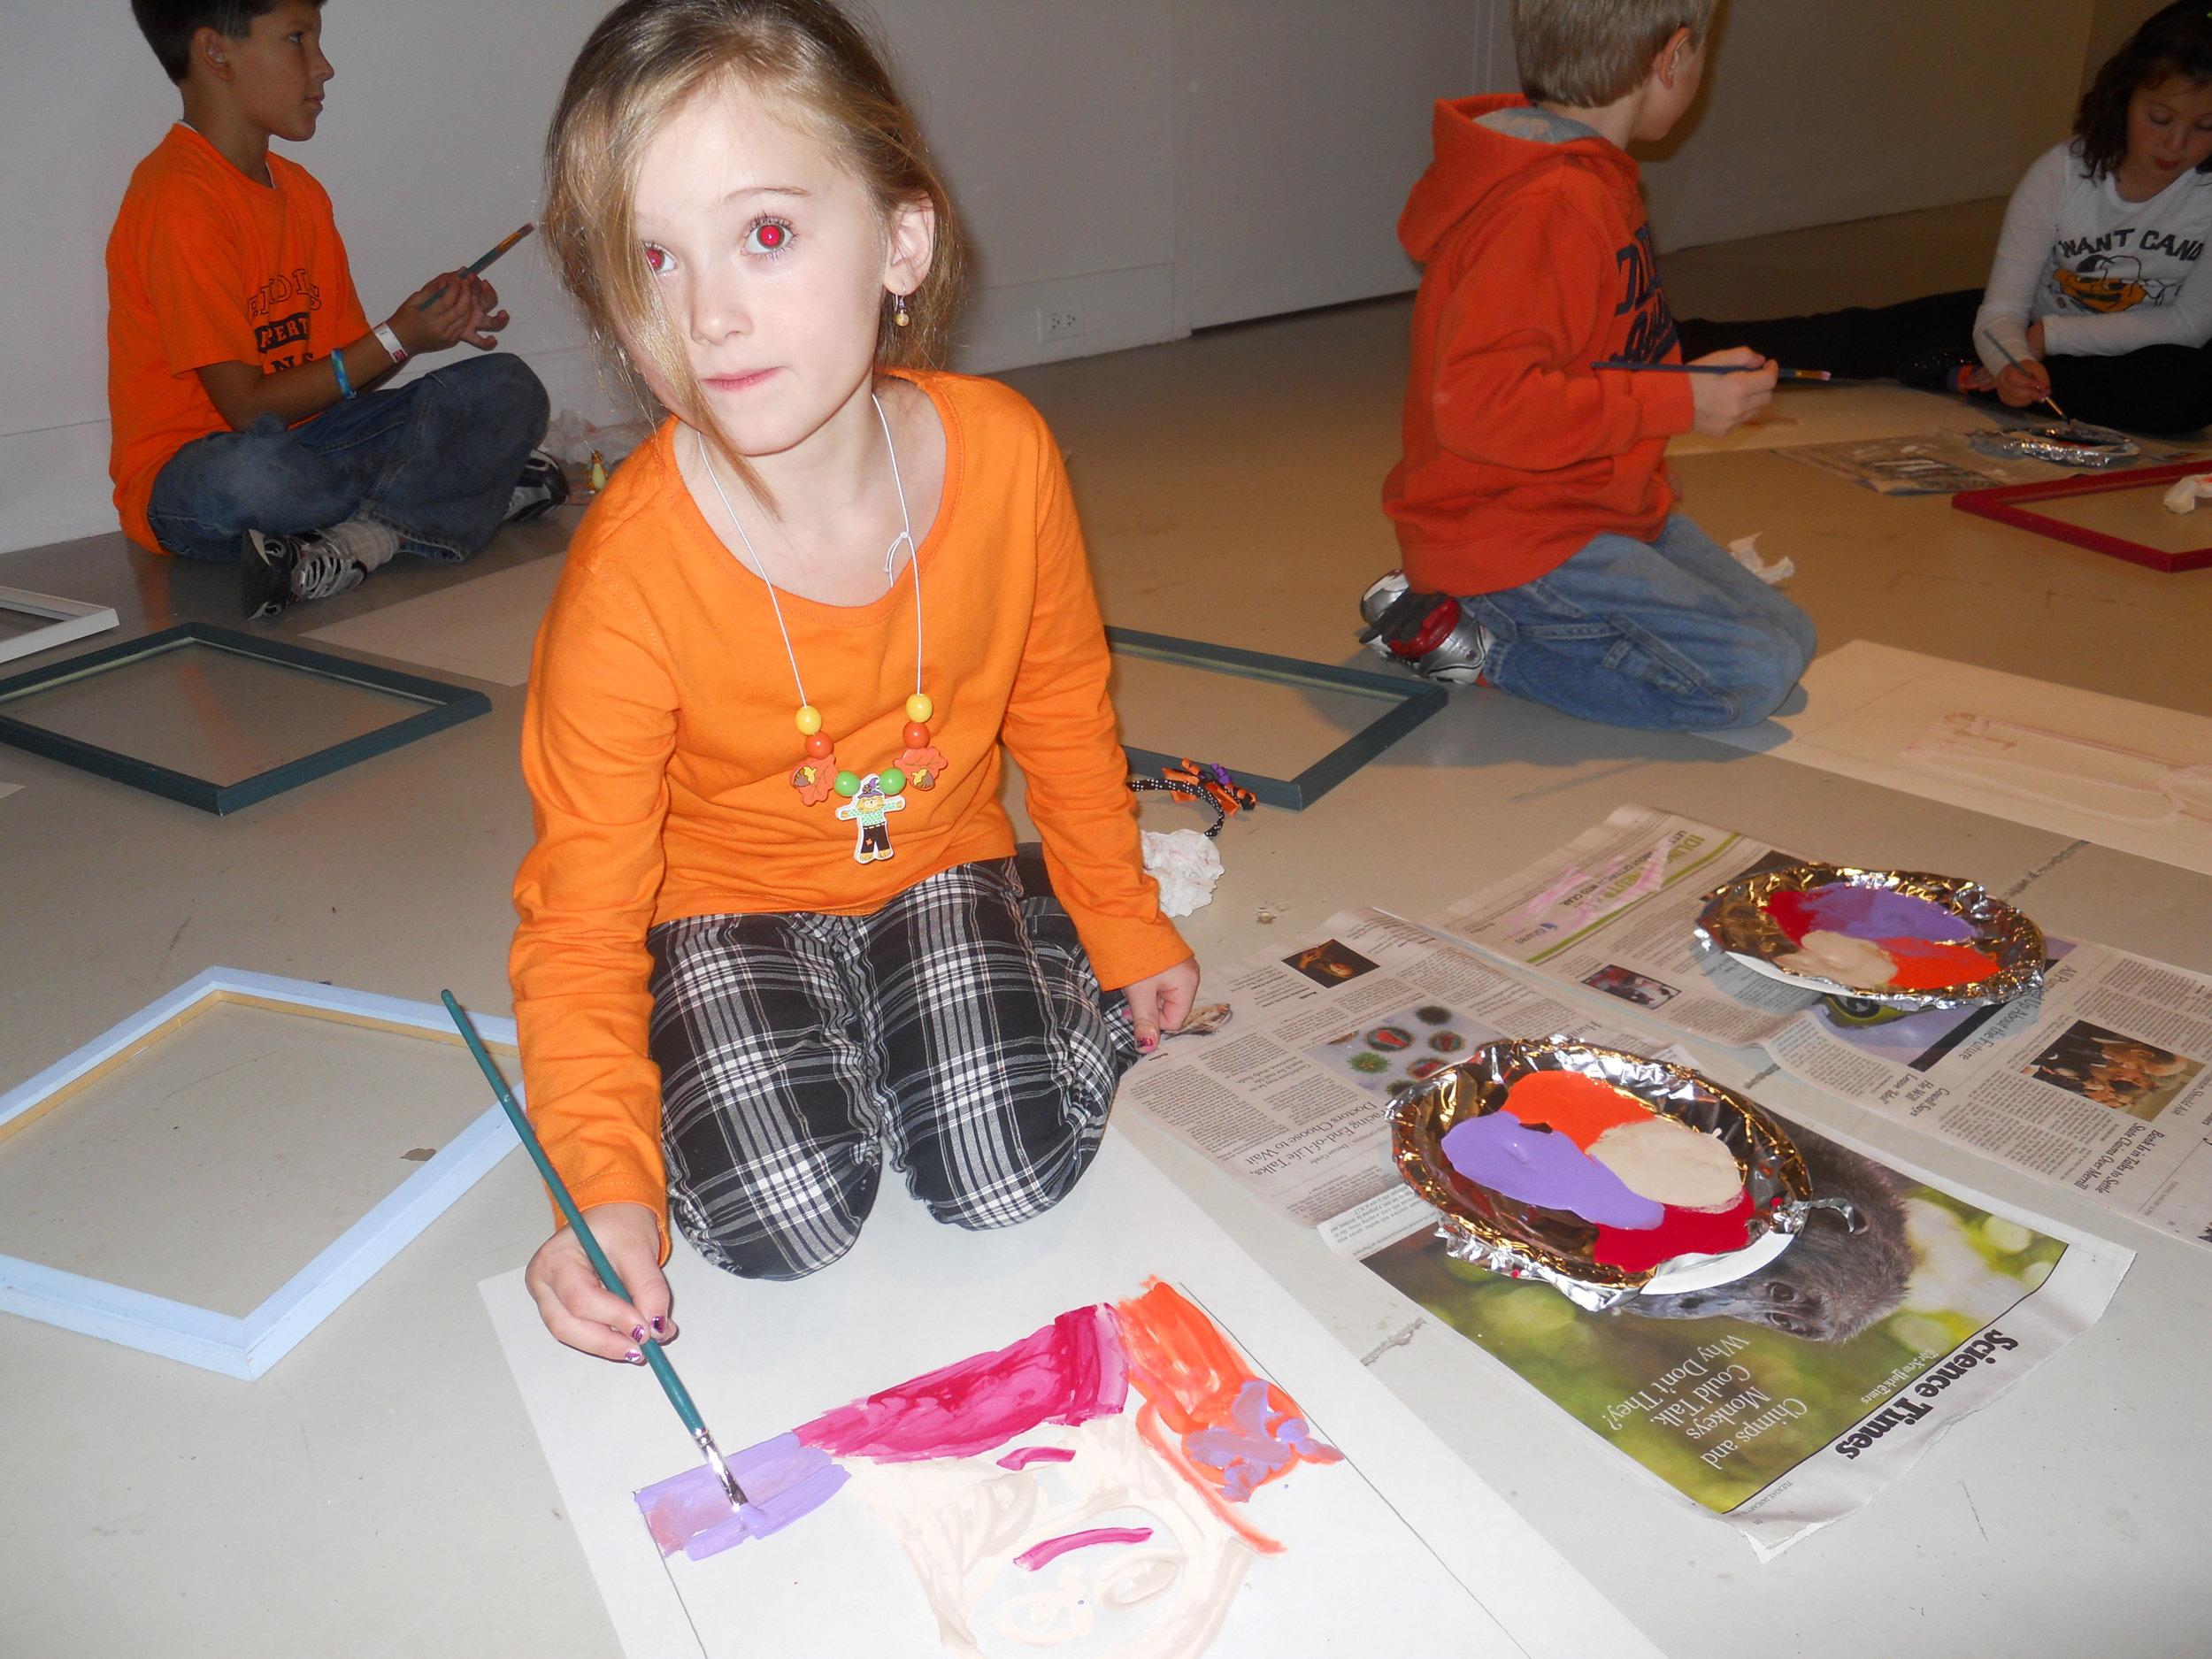 Portrait in progress from workshop after art gallery tour